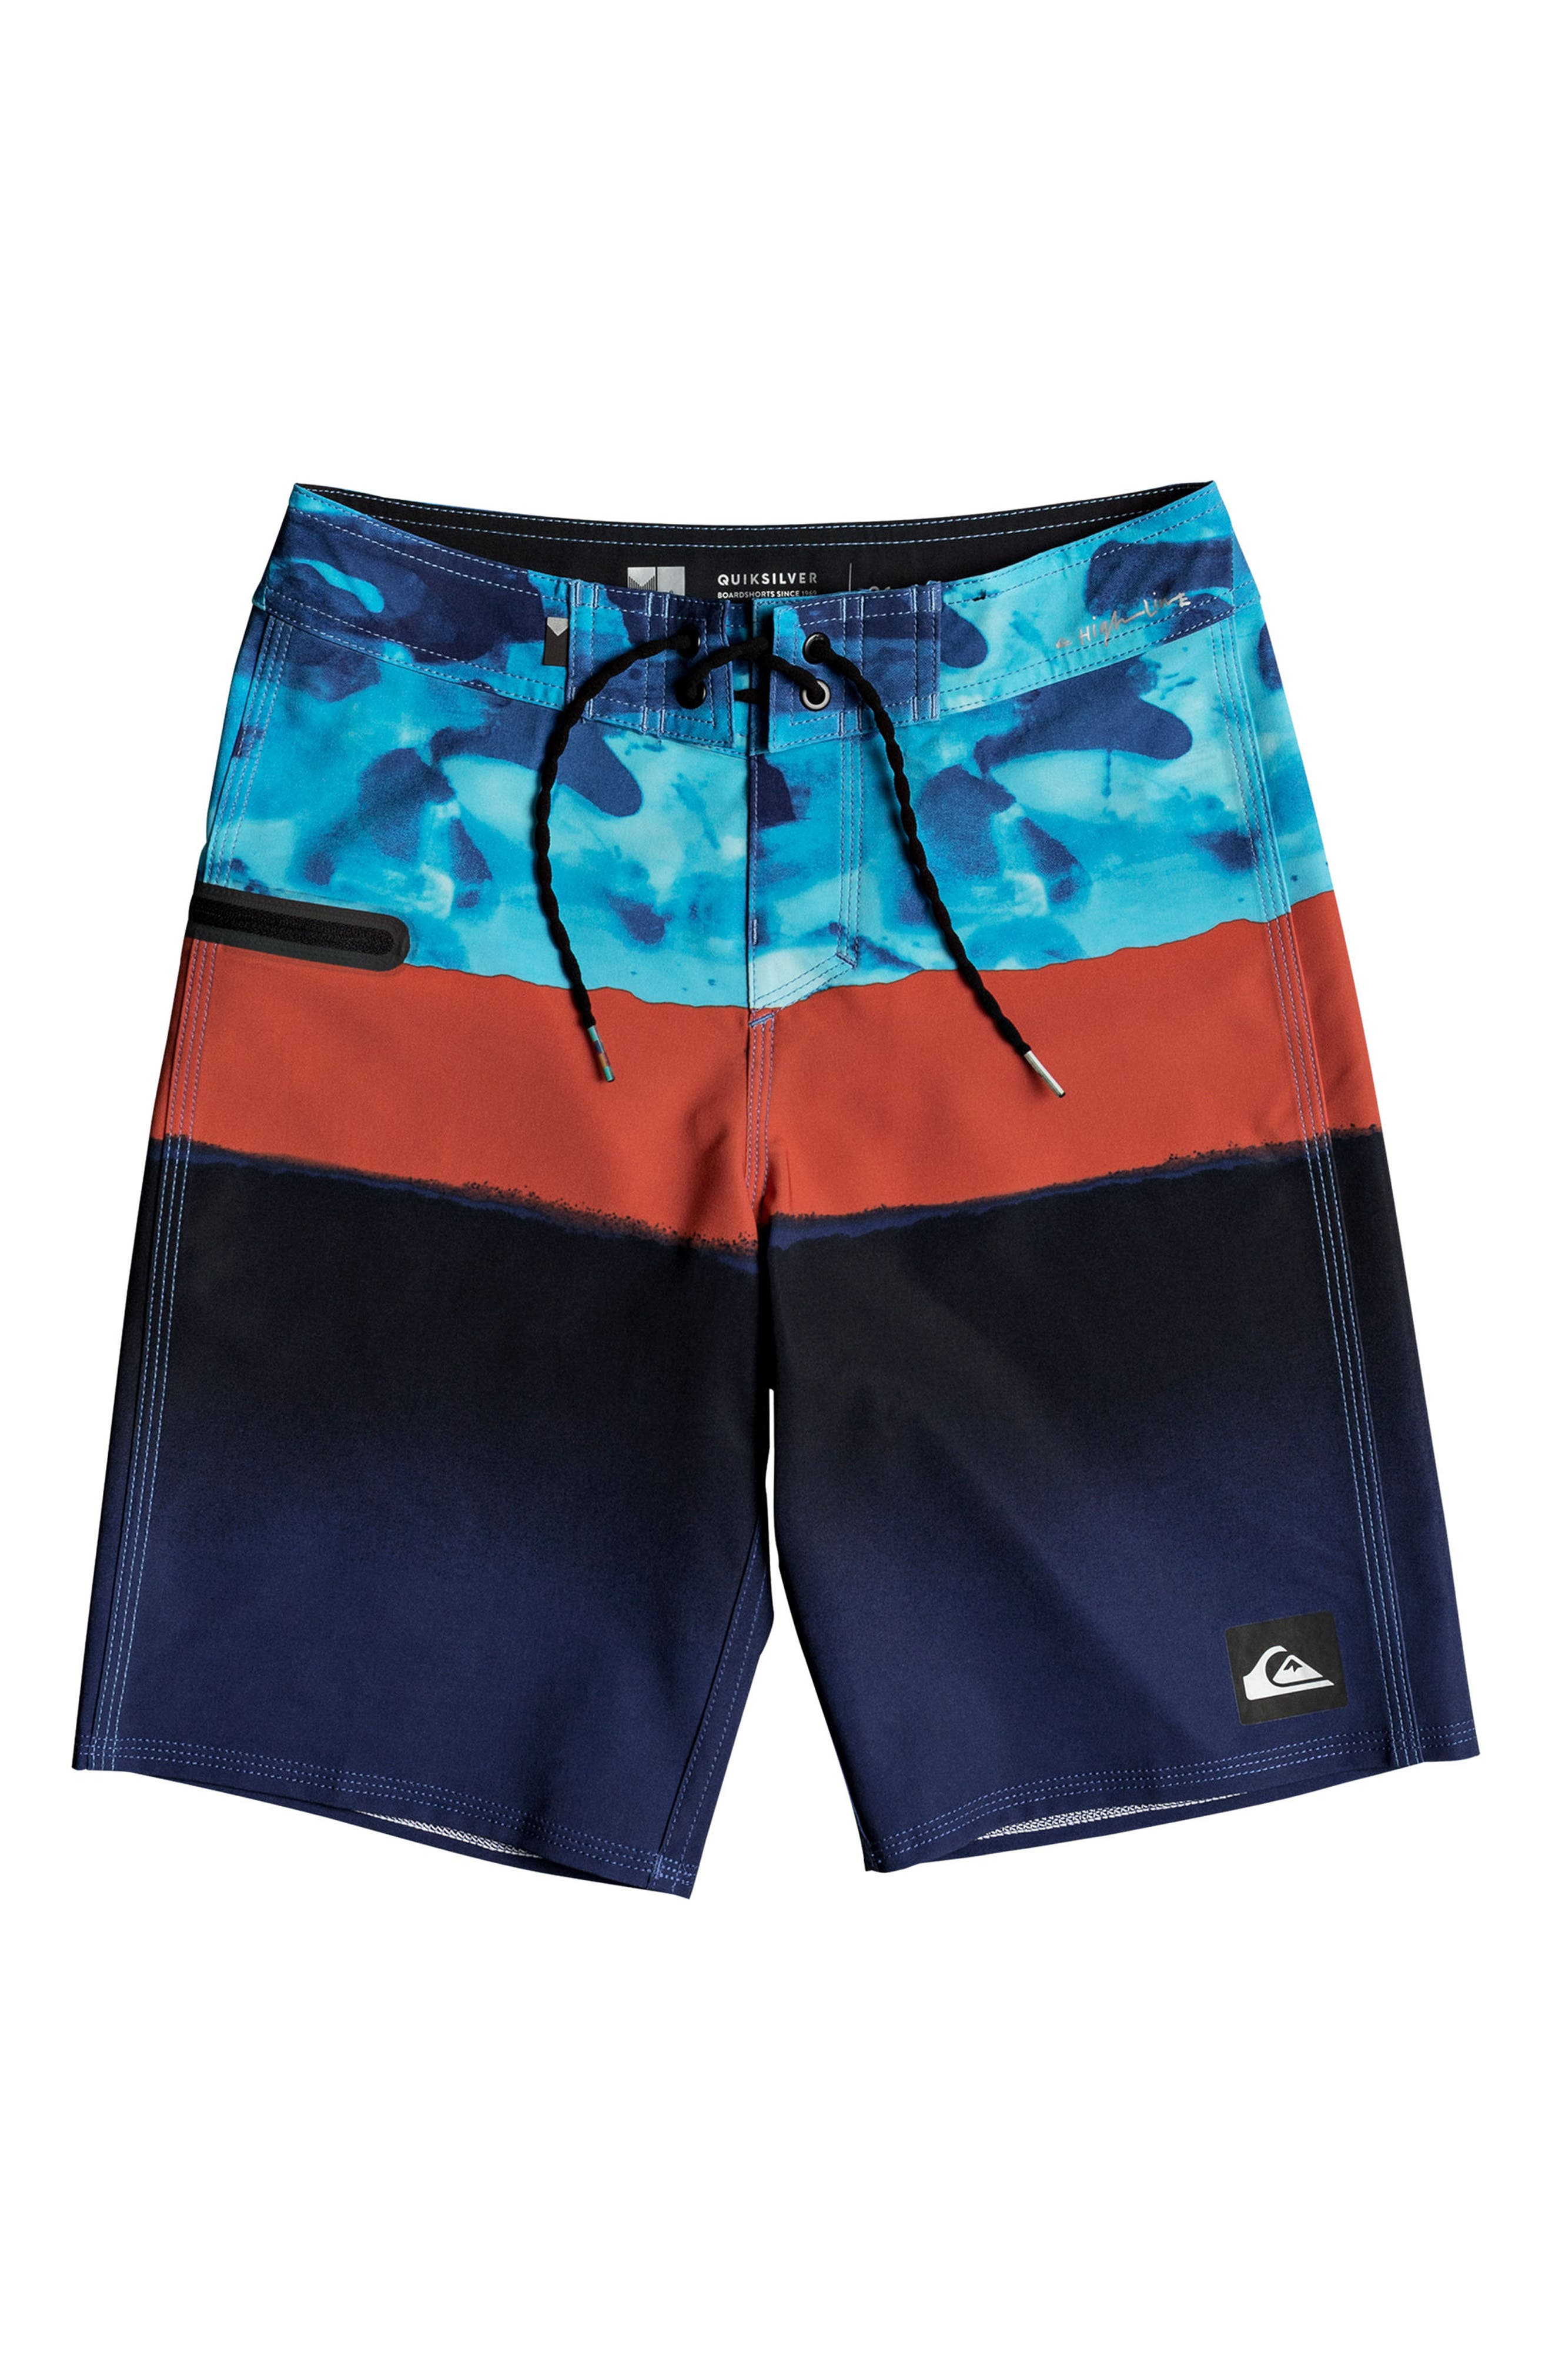 Main Image - Quiksilver Blocked Resin Camo Board Shorts (Big Boys)